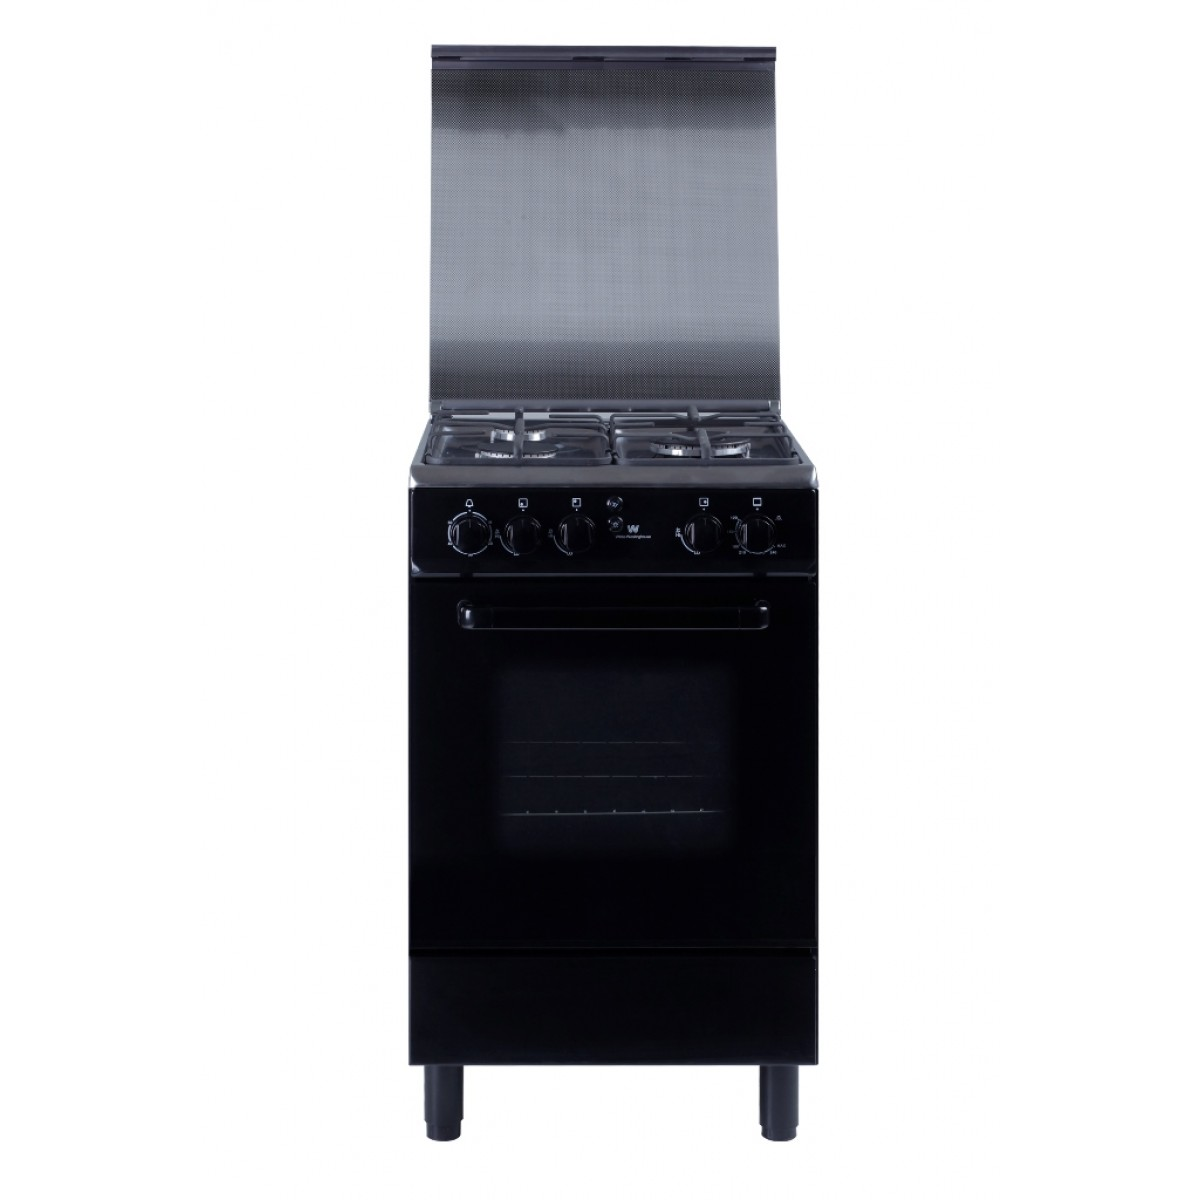 White Westinghouse WCG 534K Range - Robinsons Appliances